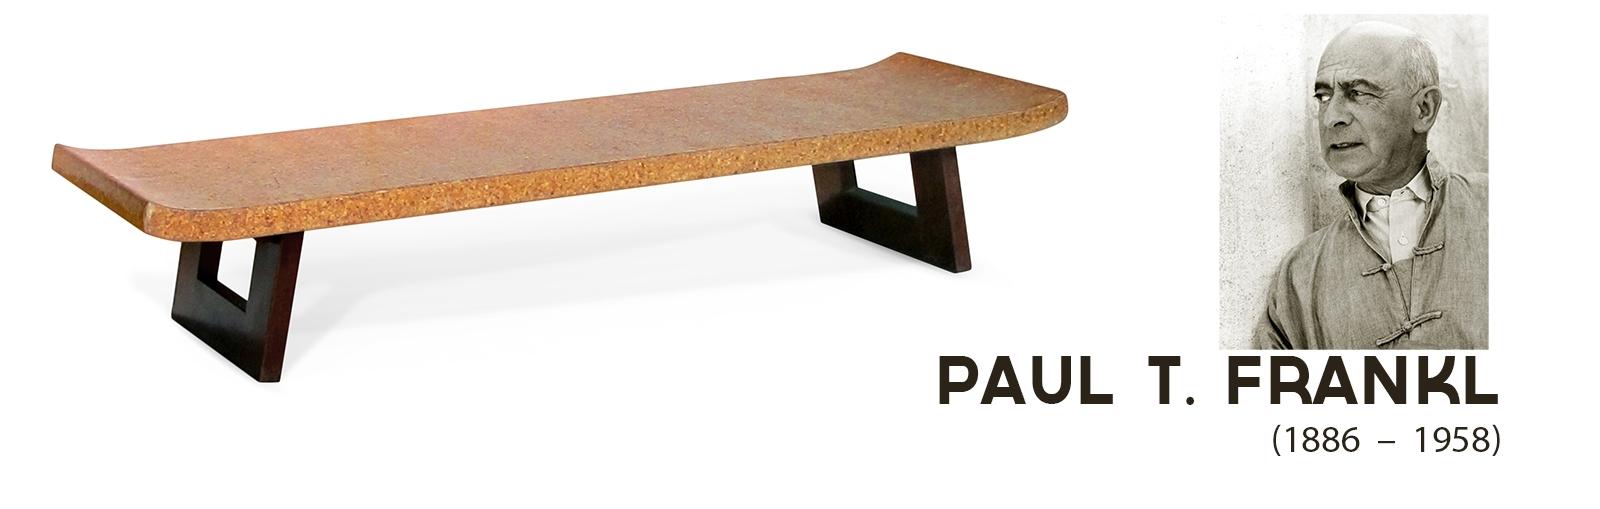 Paul T. Frankl (1886 – 1958)